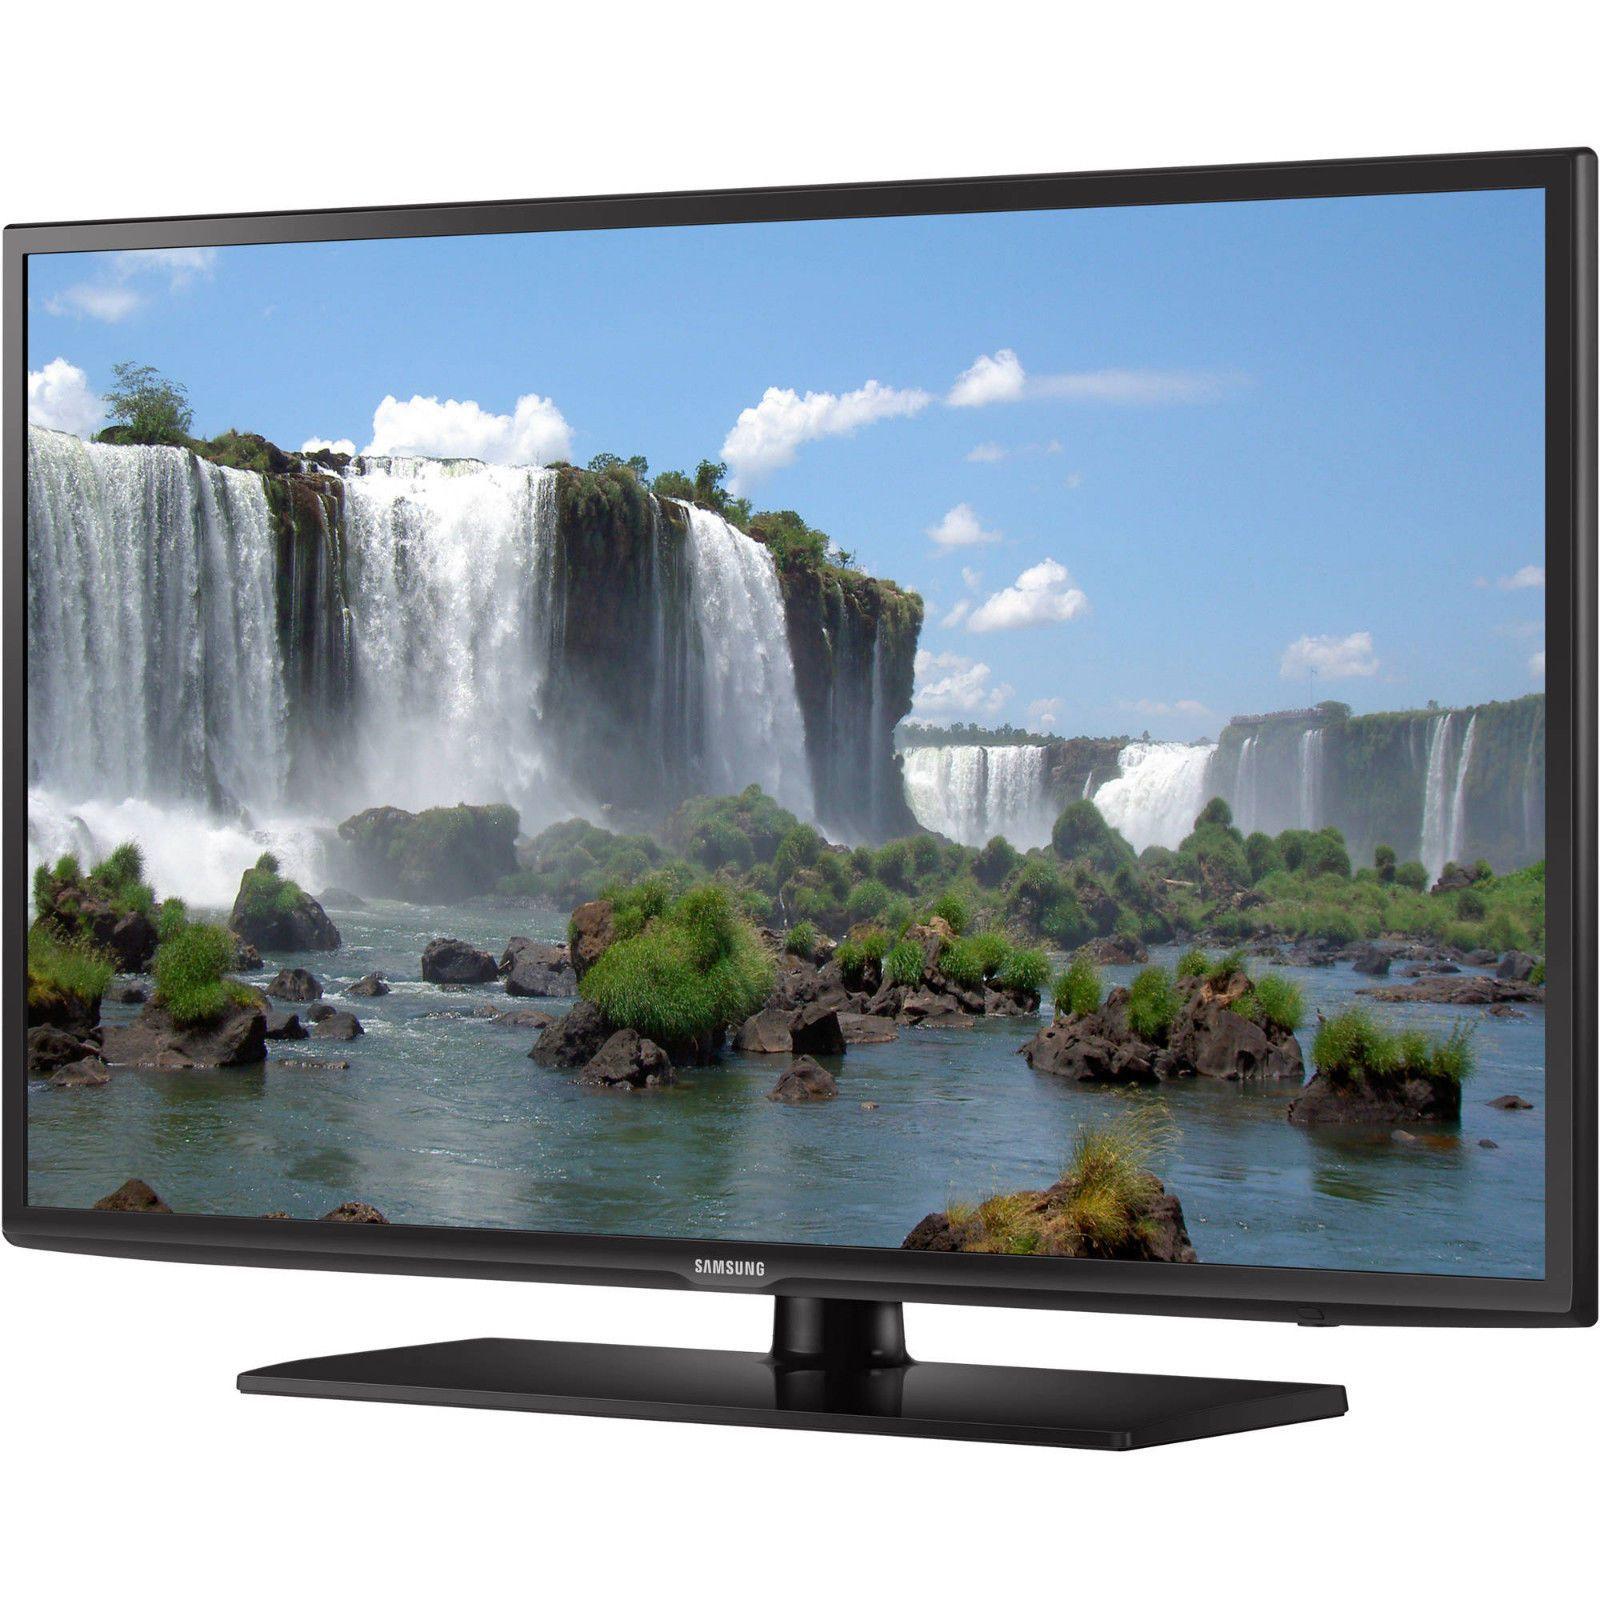 Samsung 55 1080p 60Hz LED Smart HDTV Full HD TV WiFi 2 HDMI Tuner ...